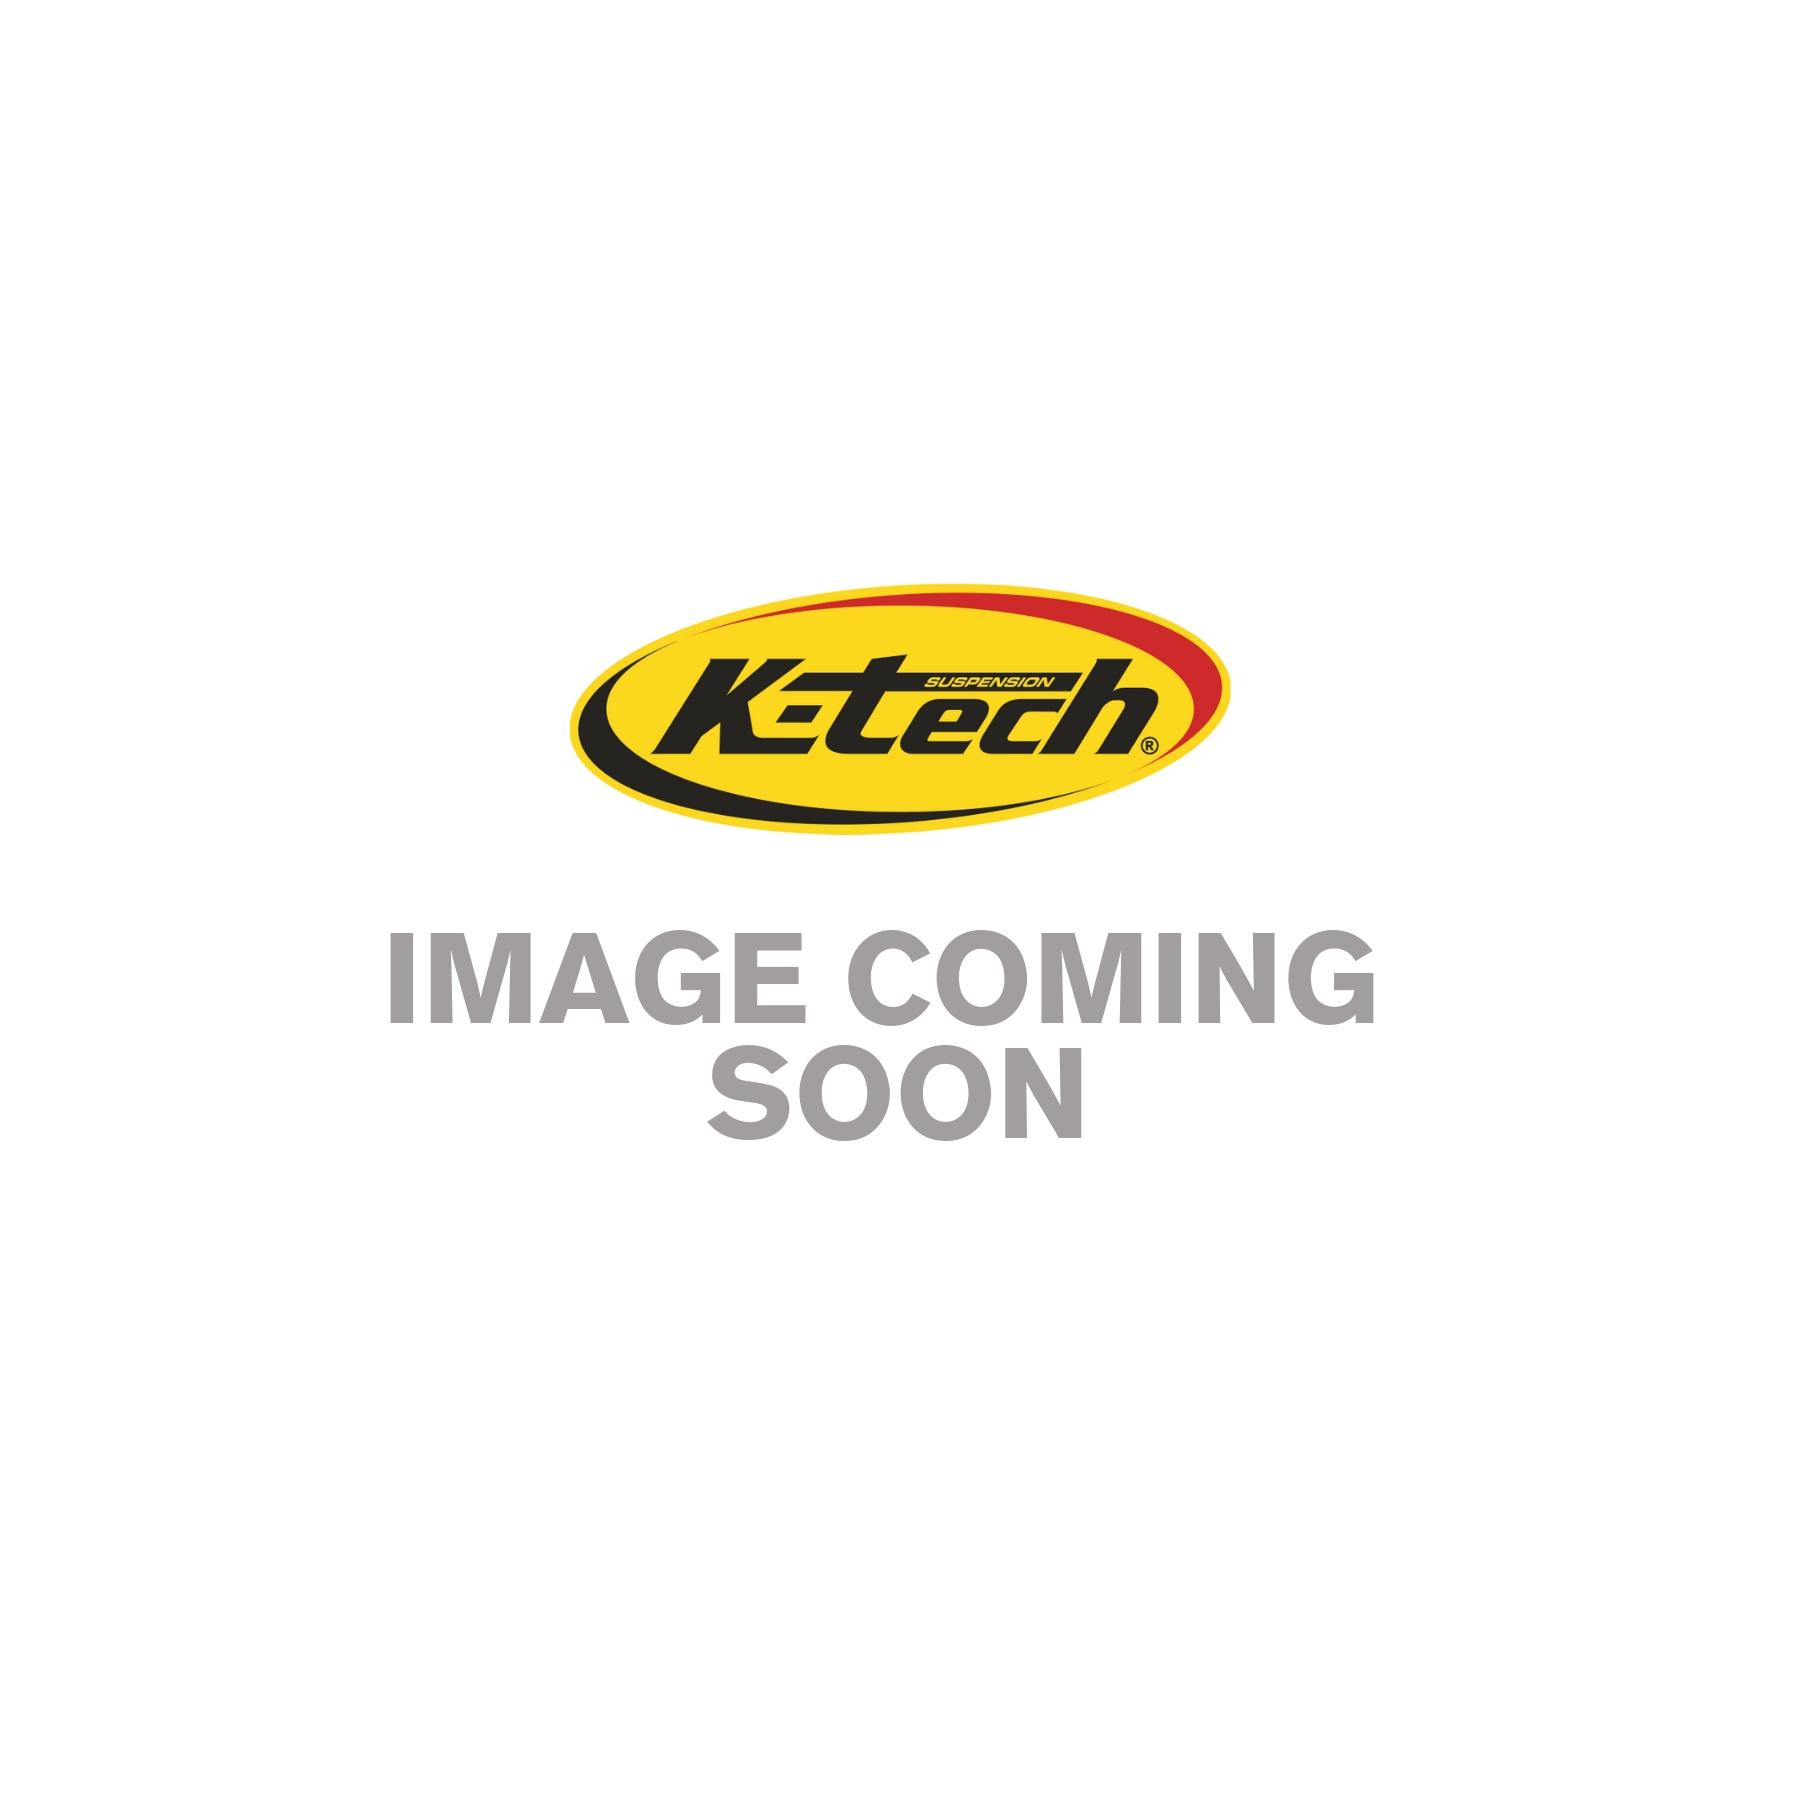 DDS Lite Shock Absorber Ducati 848/1098/1198 2007-2009 (Std Link)